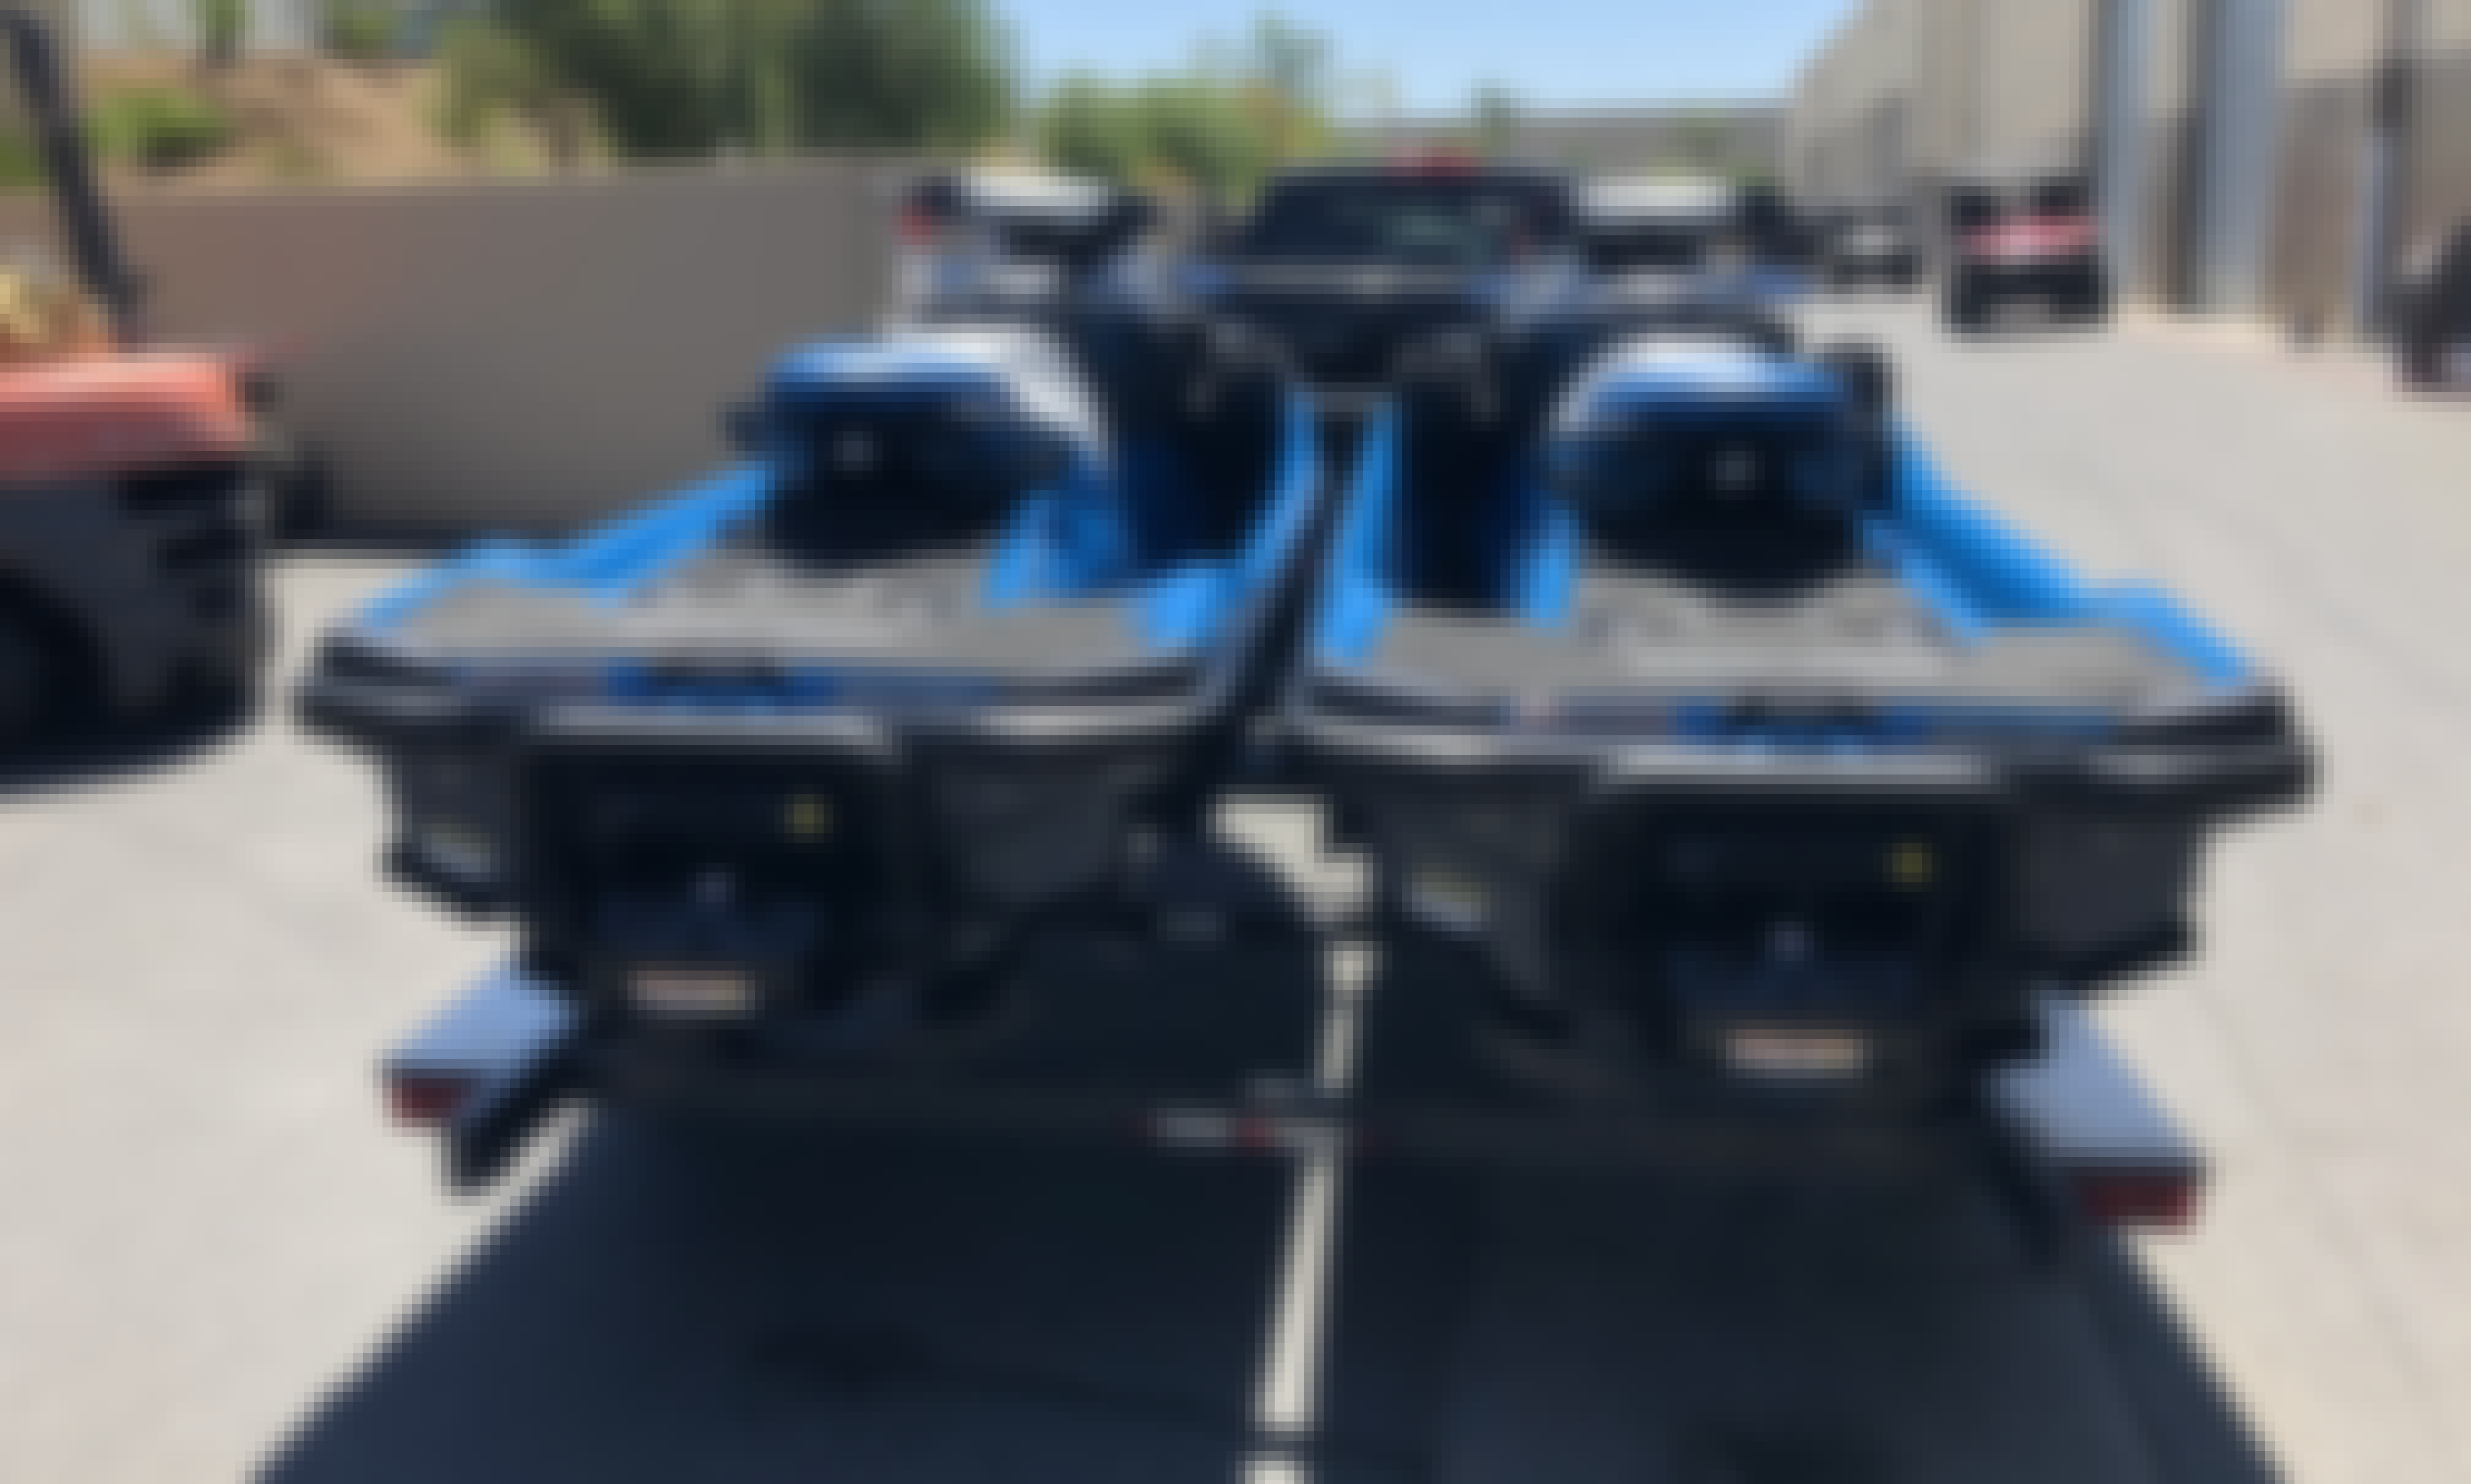 2021 Seadoo 170 GTX Jet Ski Rental (with bluetooth) in Long Beach